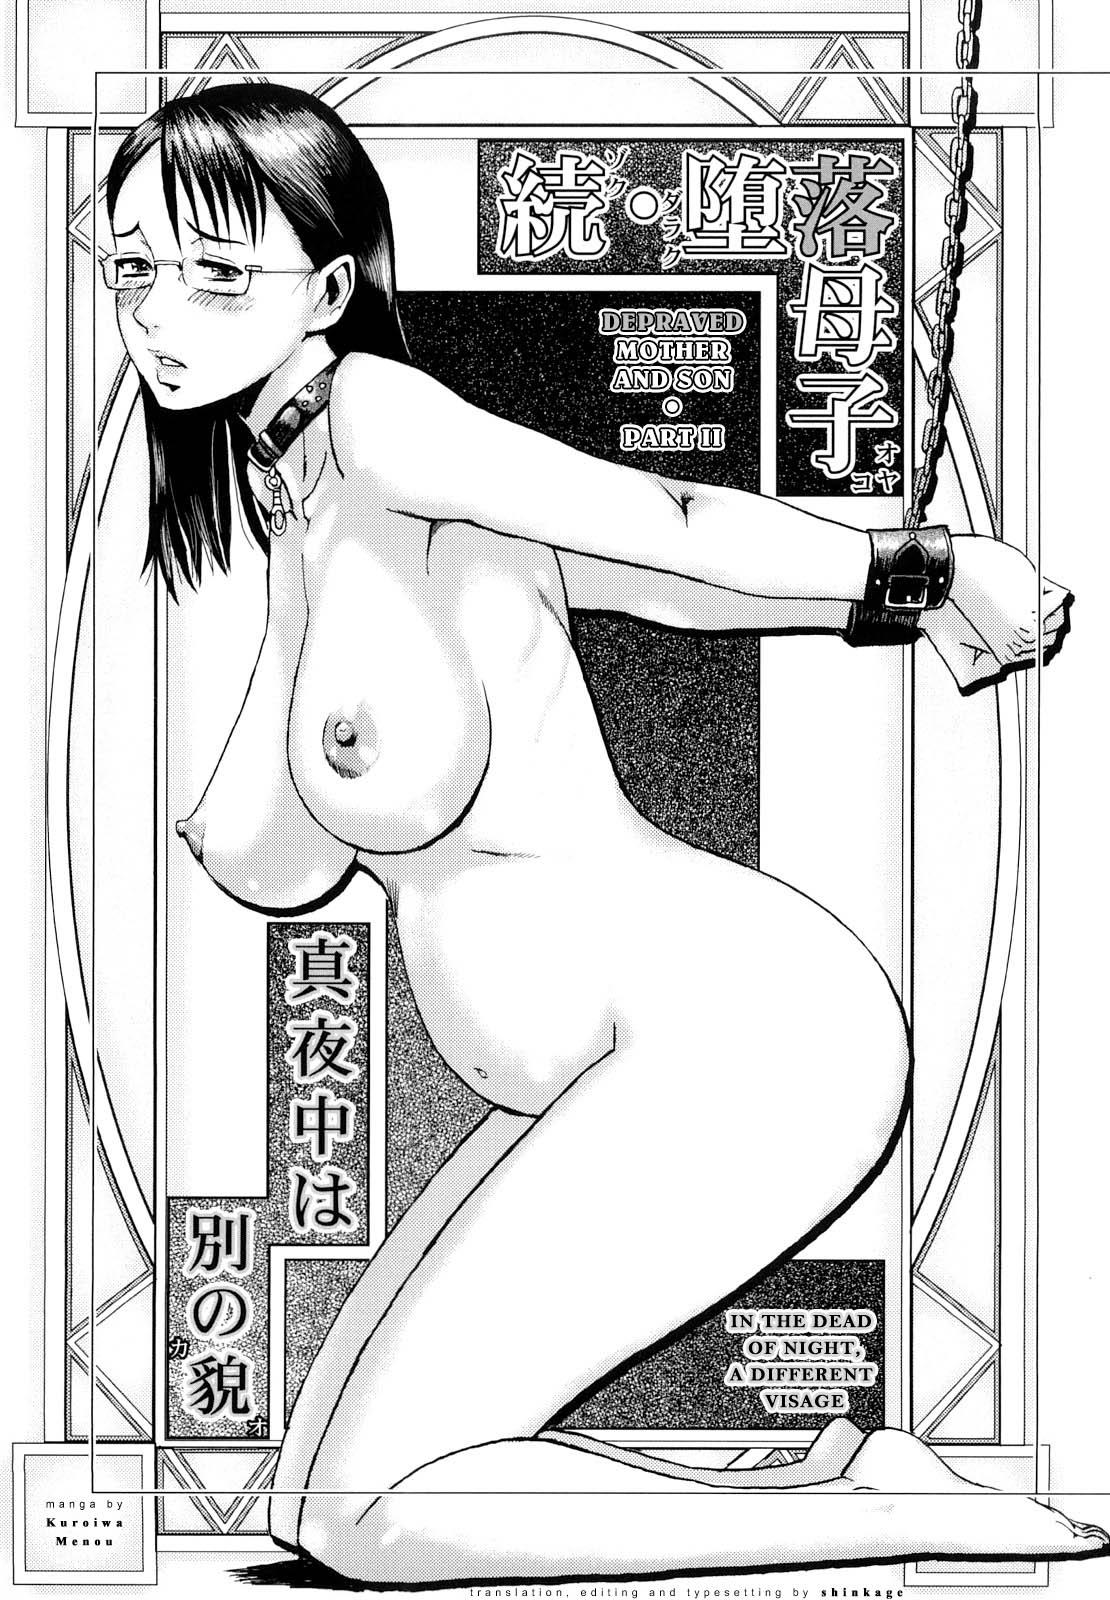 Incest Mom And Son Manga Complete zoku daraku oyako (depraved mother and son part ii)kuroiwa